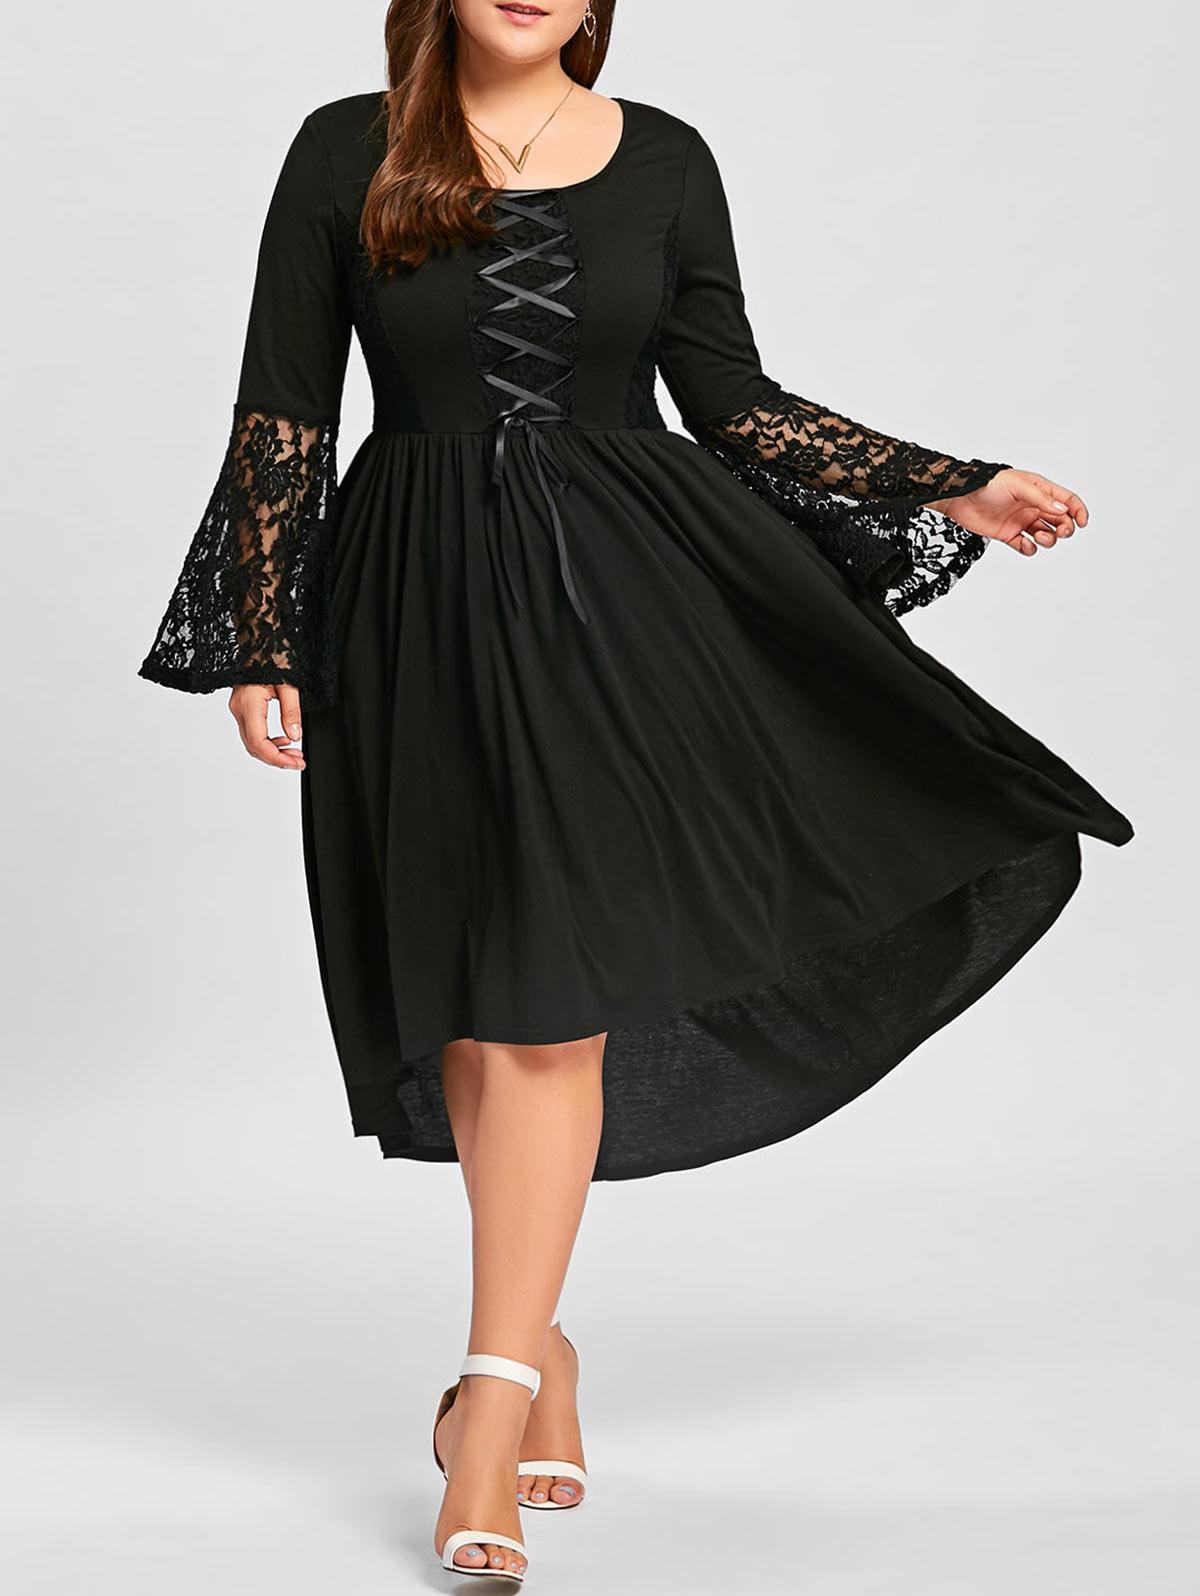 Plus Size Lace Panel Lace Up High Low Dress